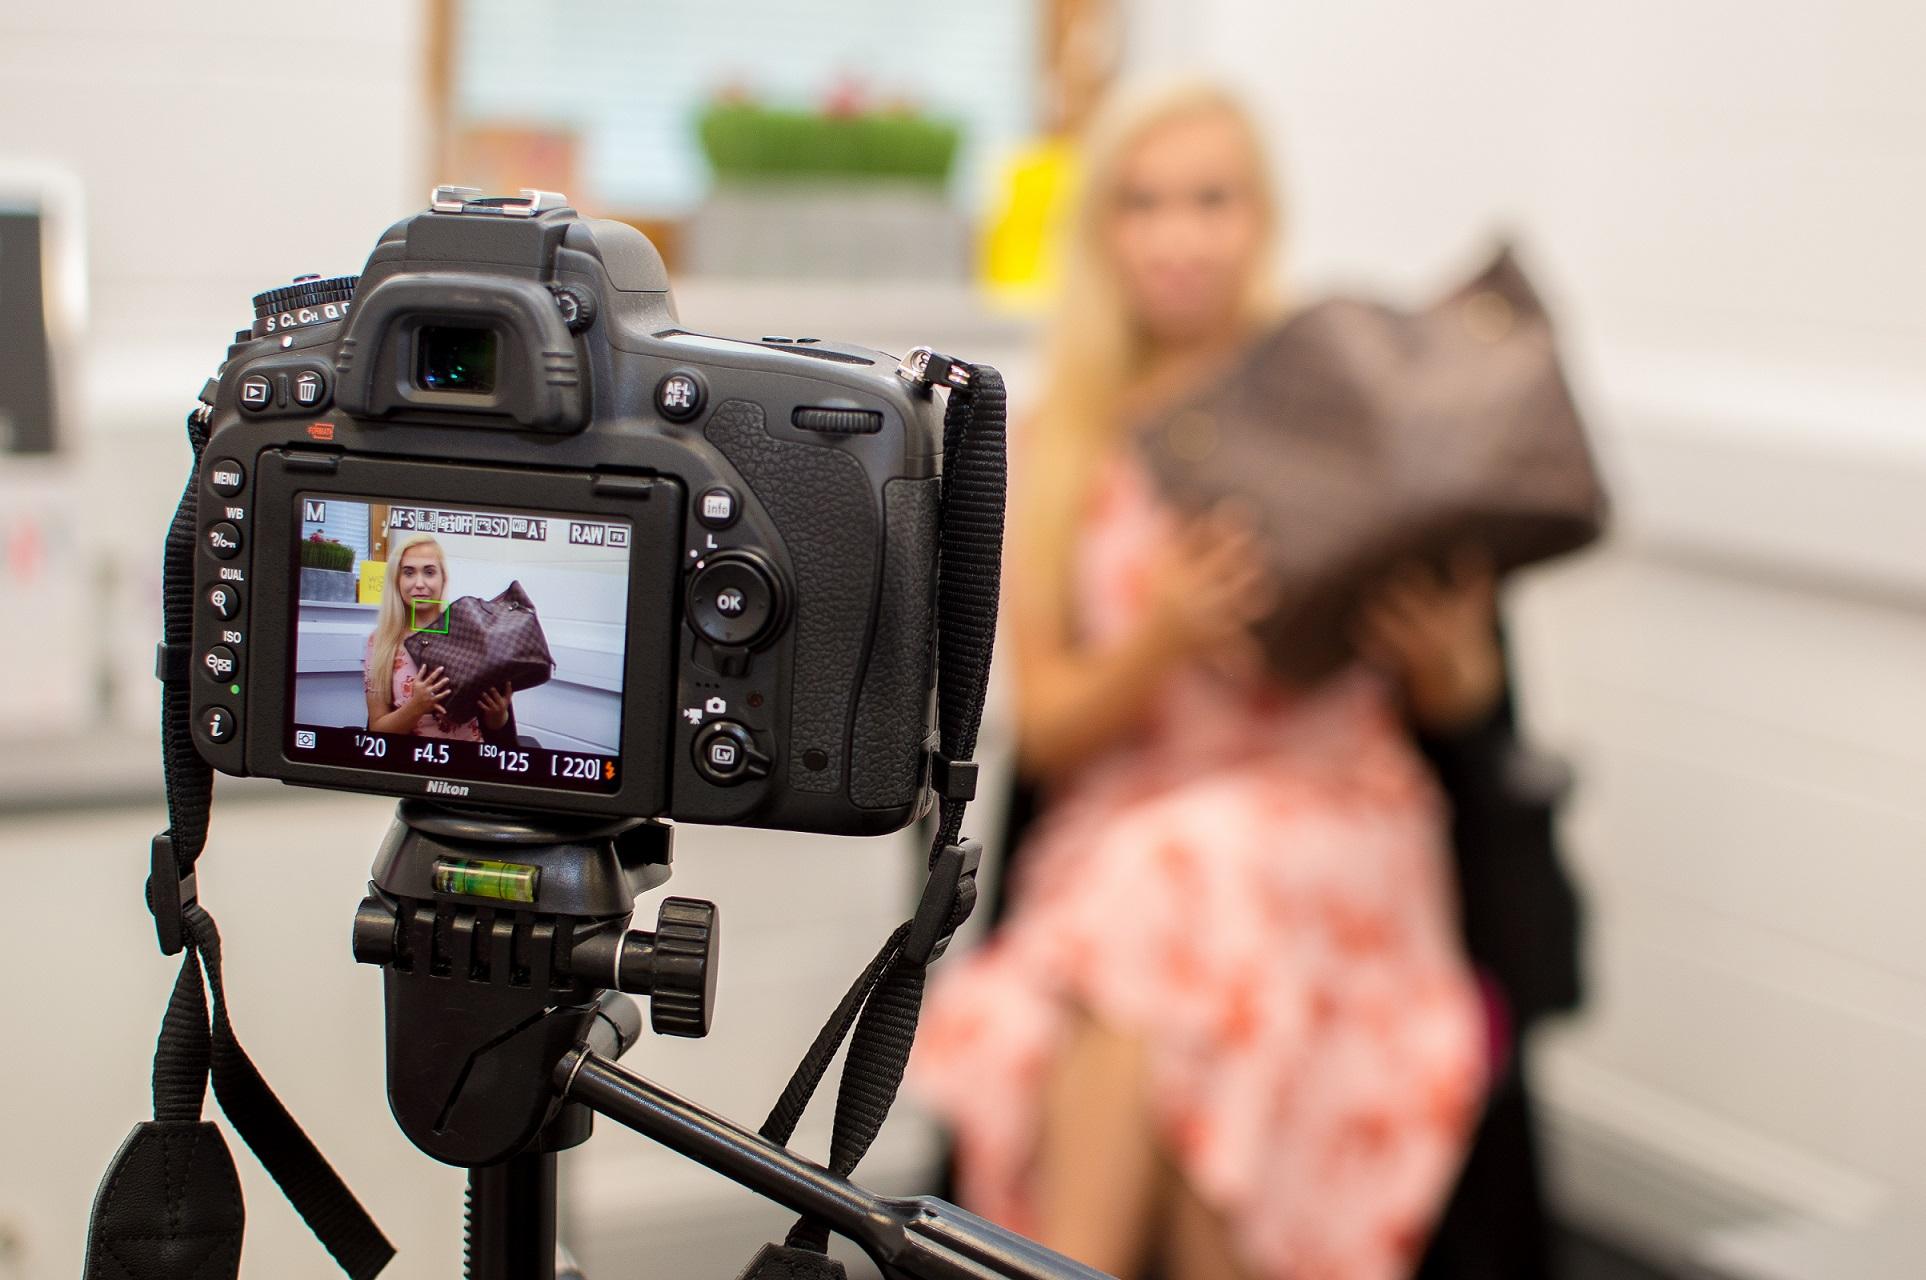 fashion blogger girl vlogging to camera with luxury louis vuitton handbag